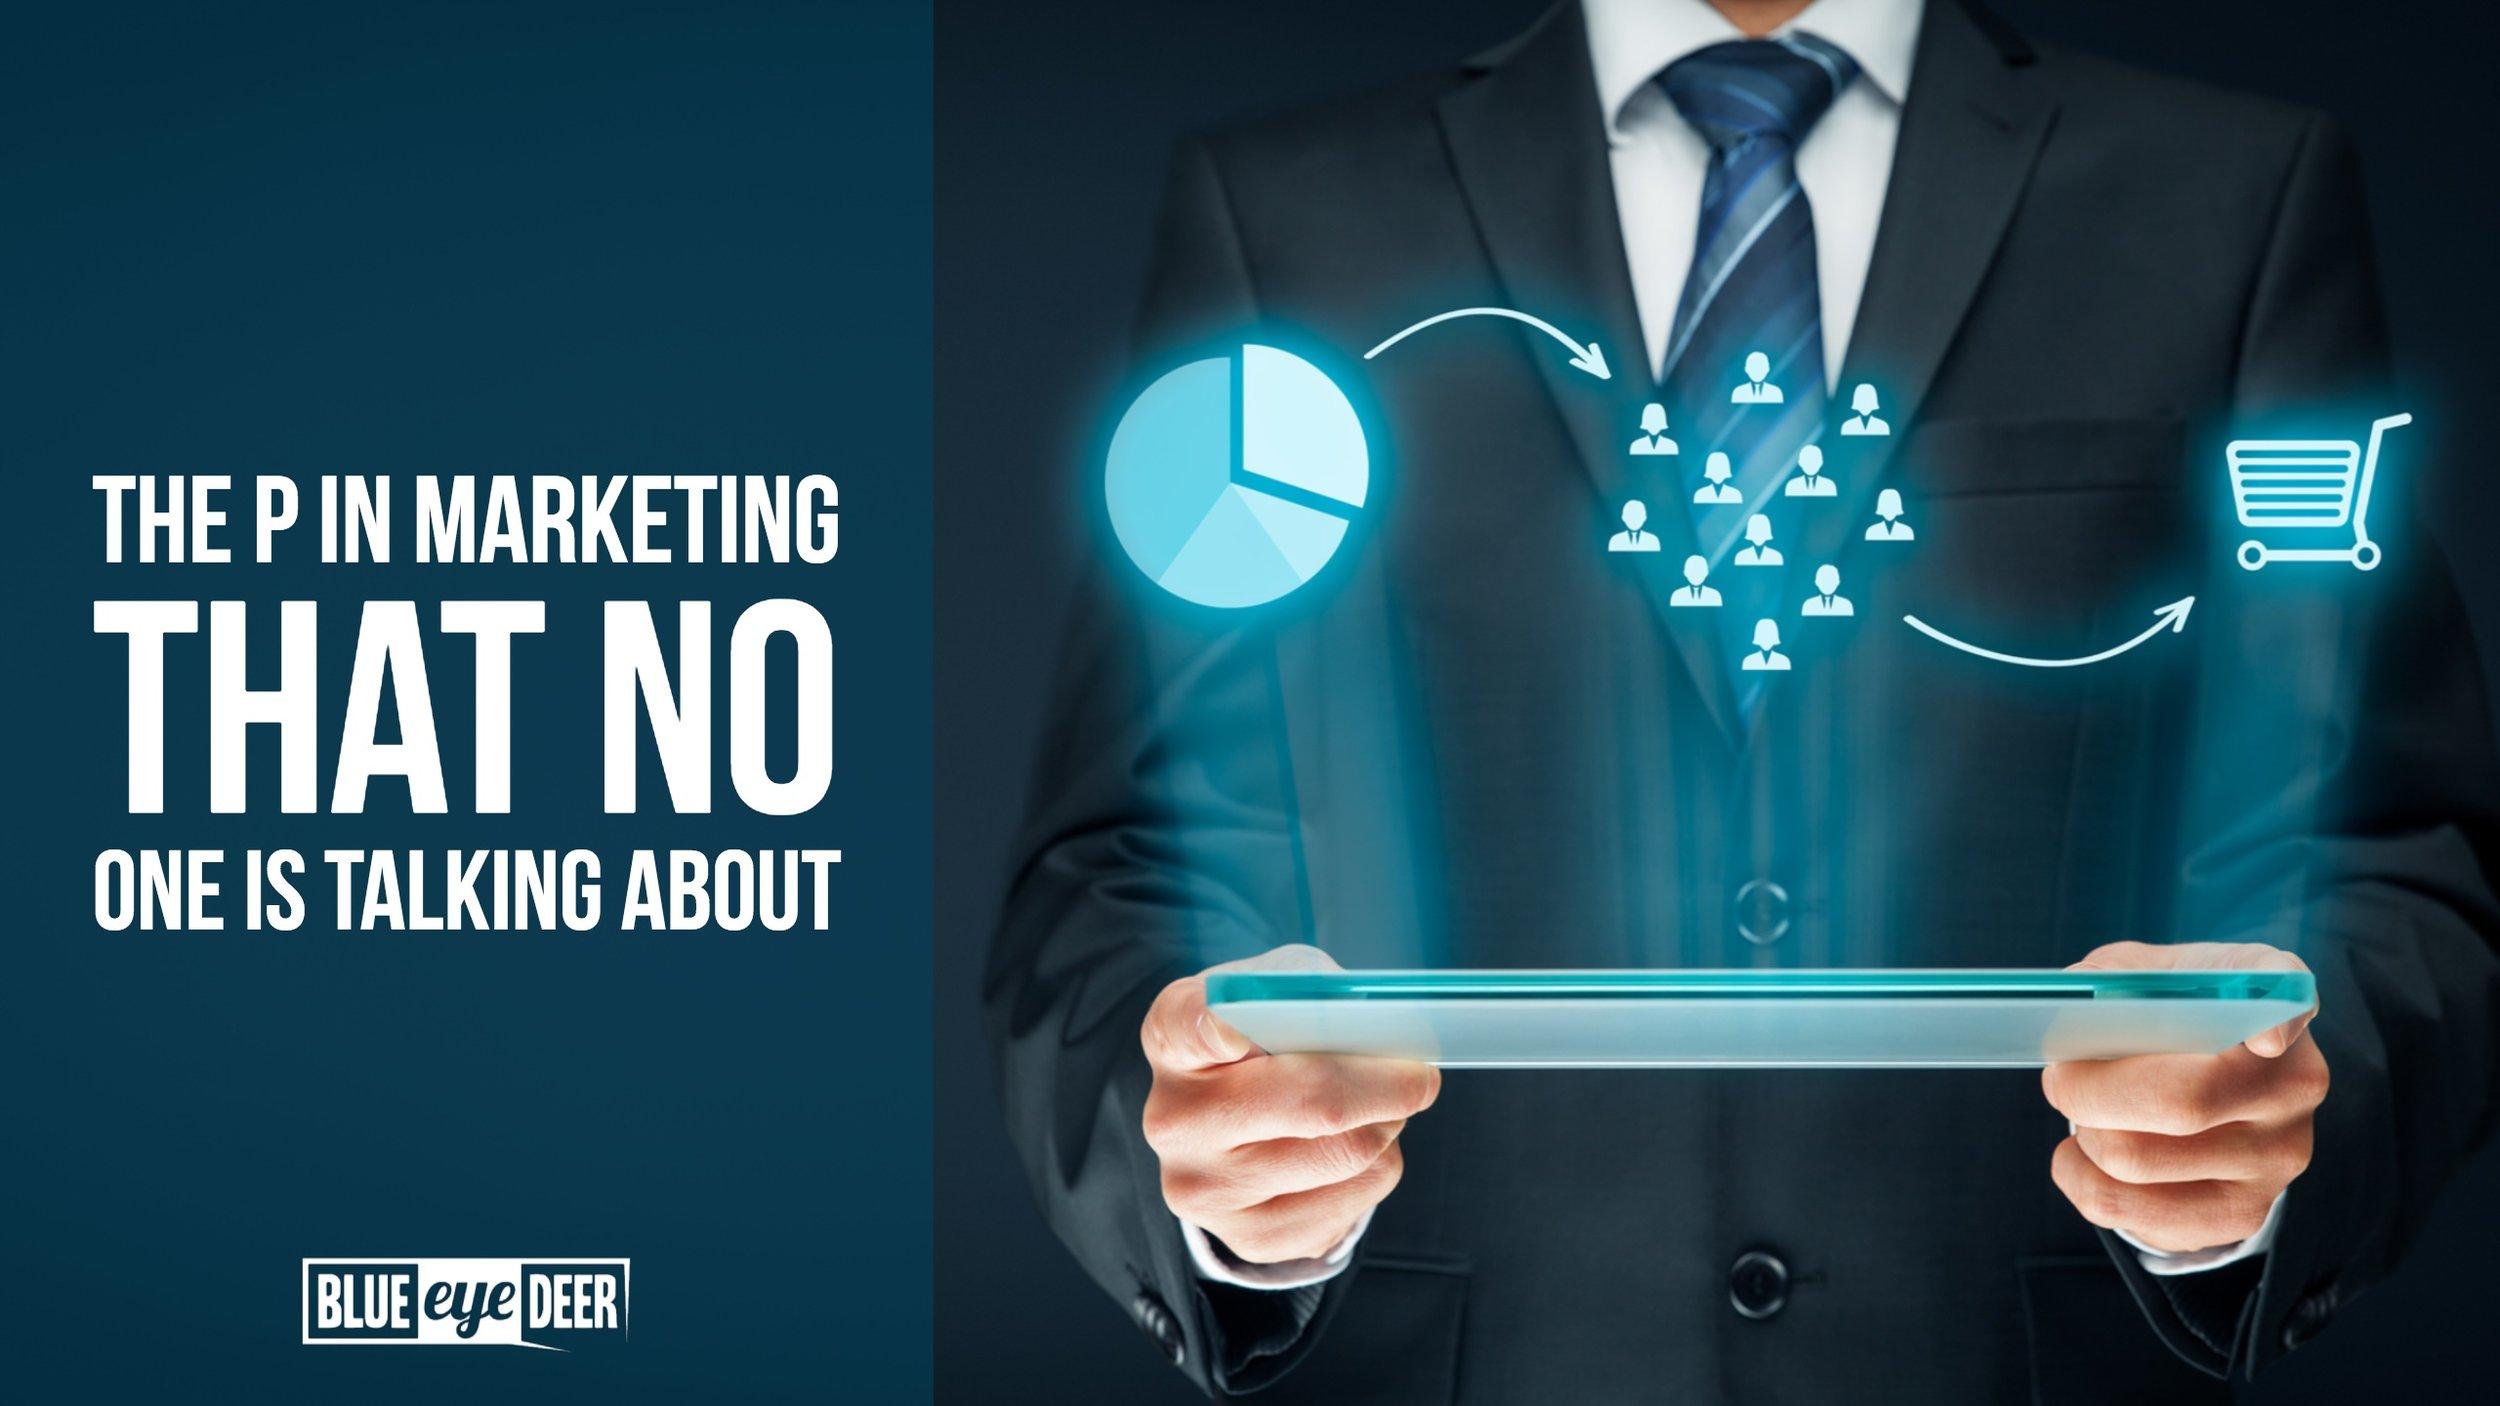 positioning-in-marketing-blog-image.jpg